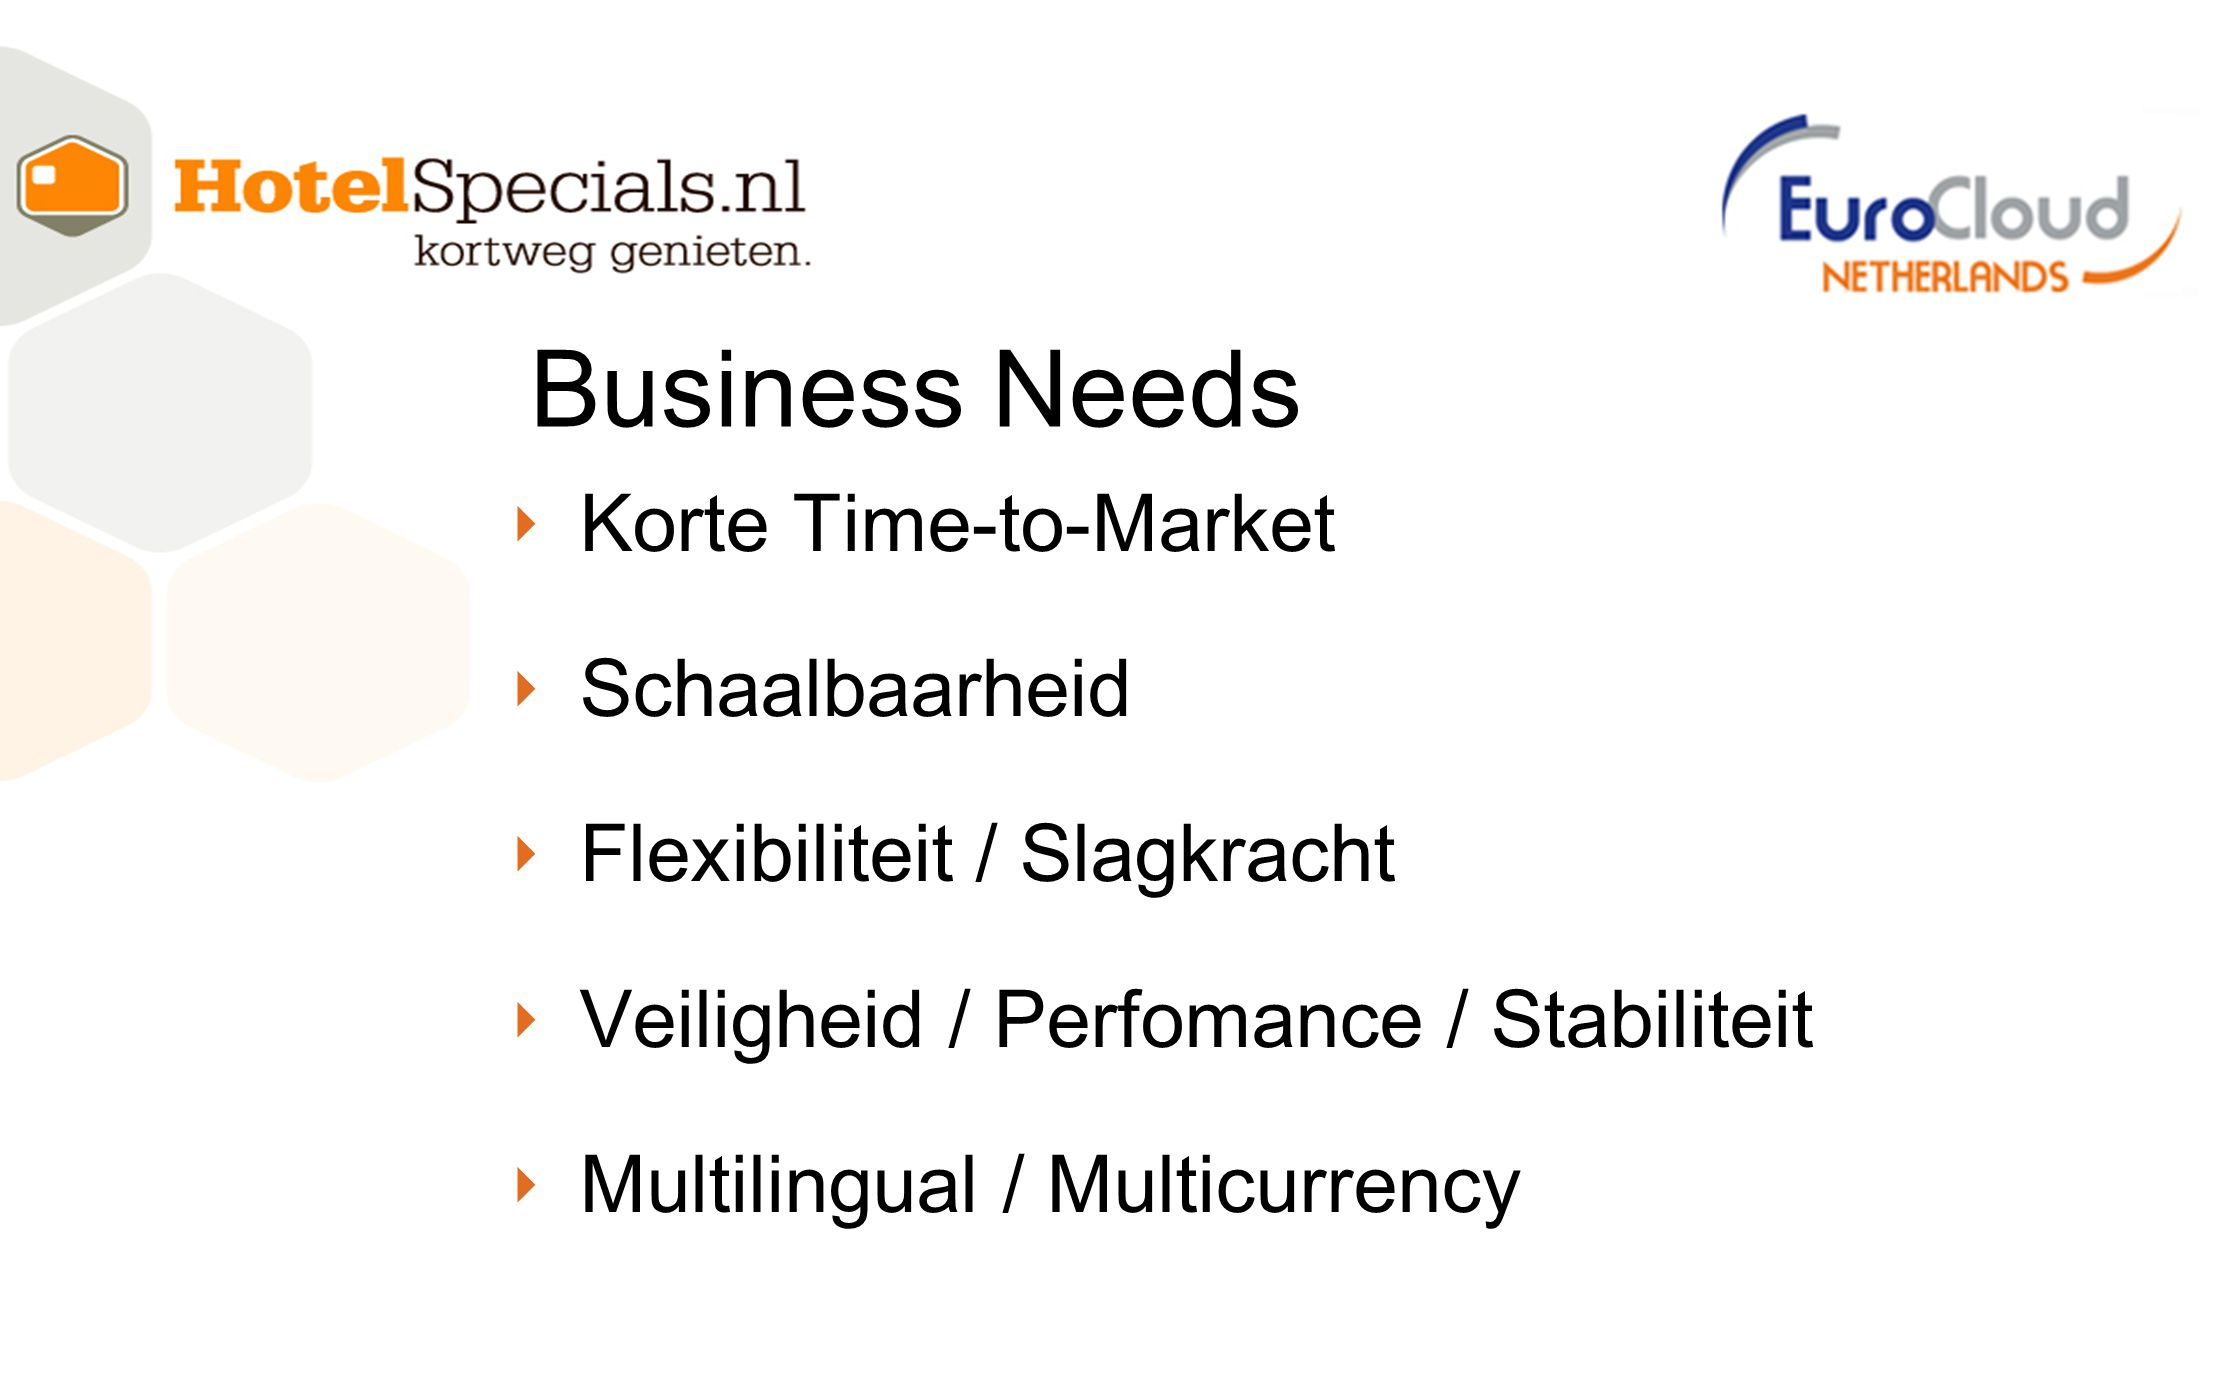 ‣ Korte Time-to-Market ‣ Schaalbaarheid ‣ Flexibiliteit / Slagkracht ‣ Veiligheid / Perfomance / Stabiliteit ‣ Multilingual / Multicurrency Business Needs